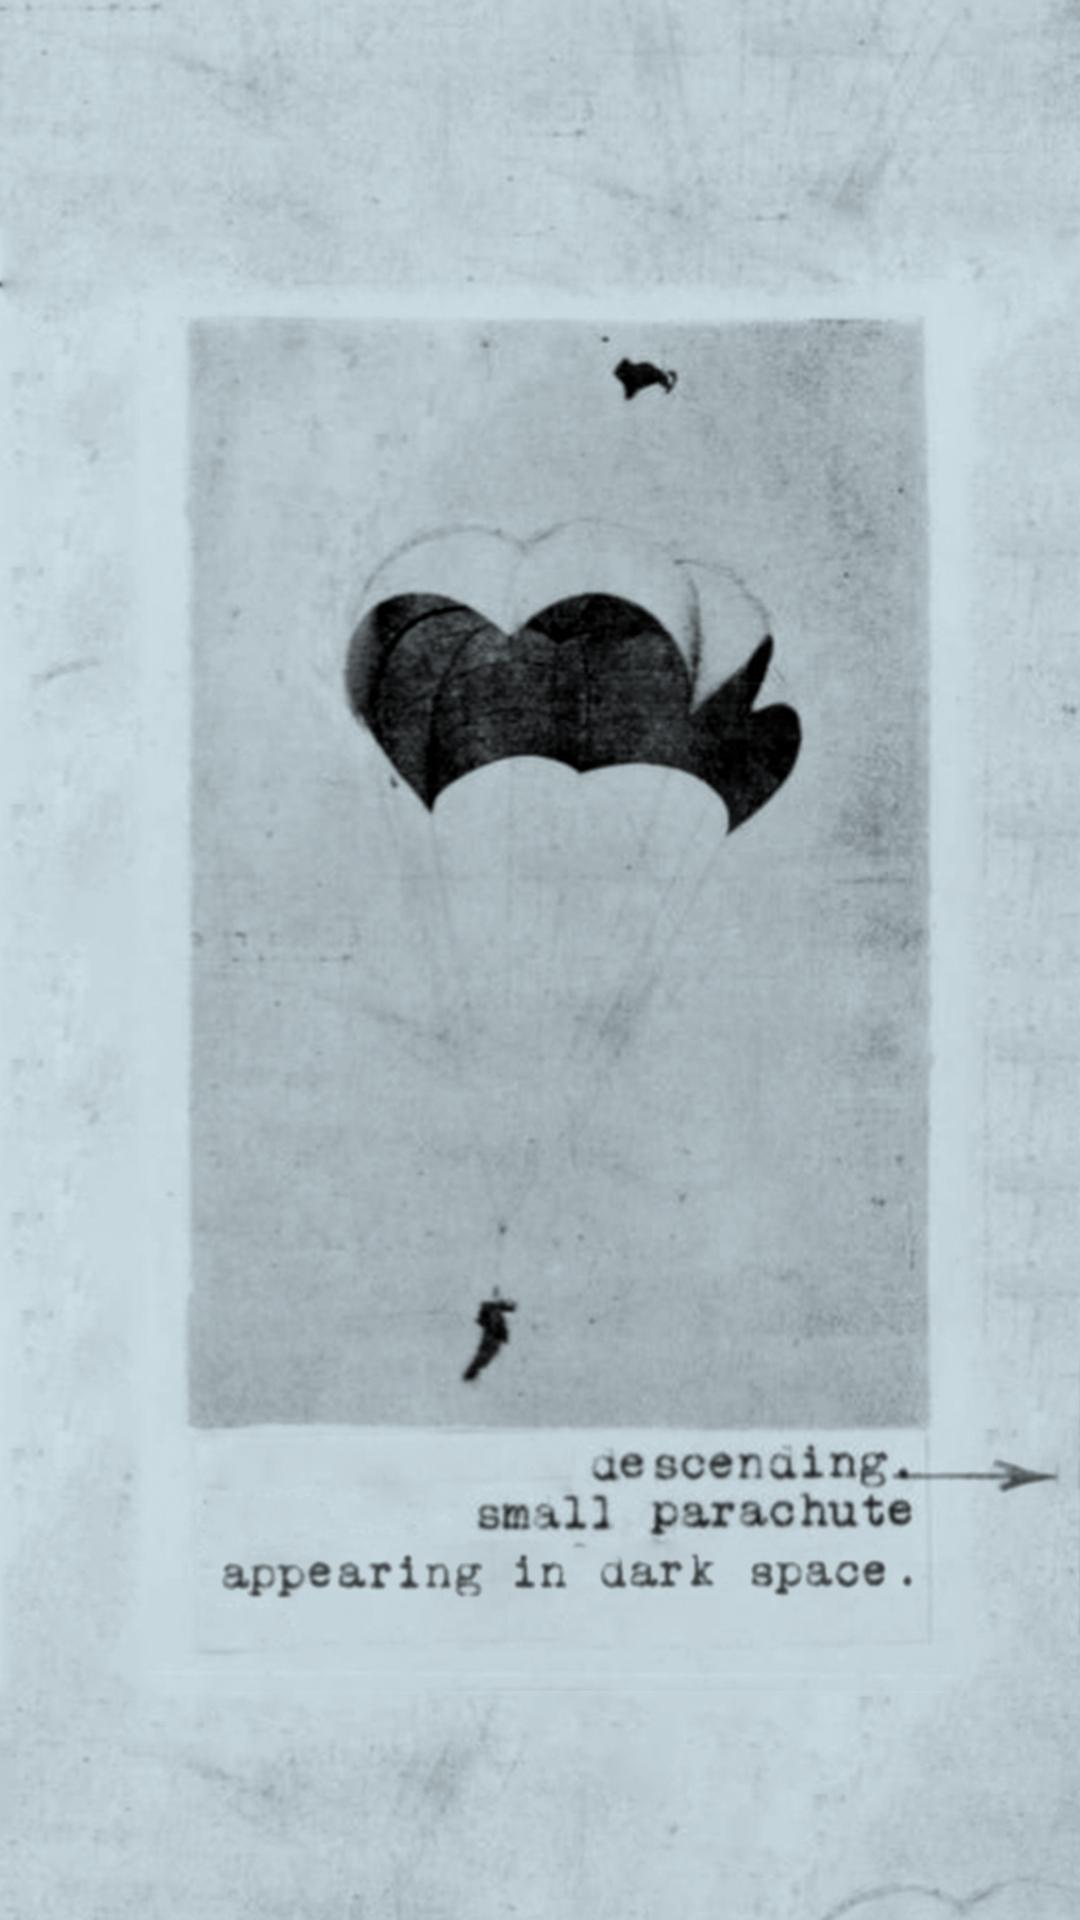 smallparachute.jpg